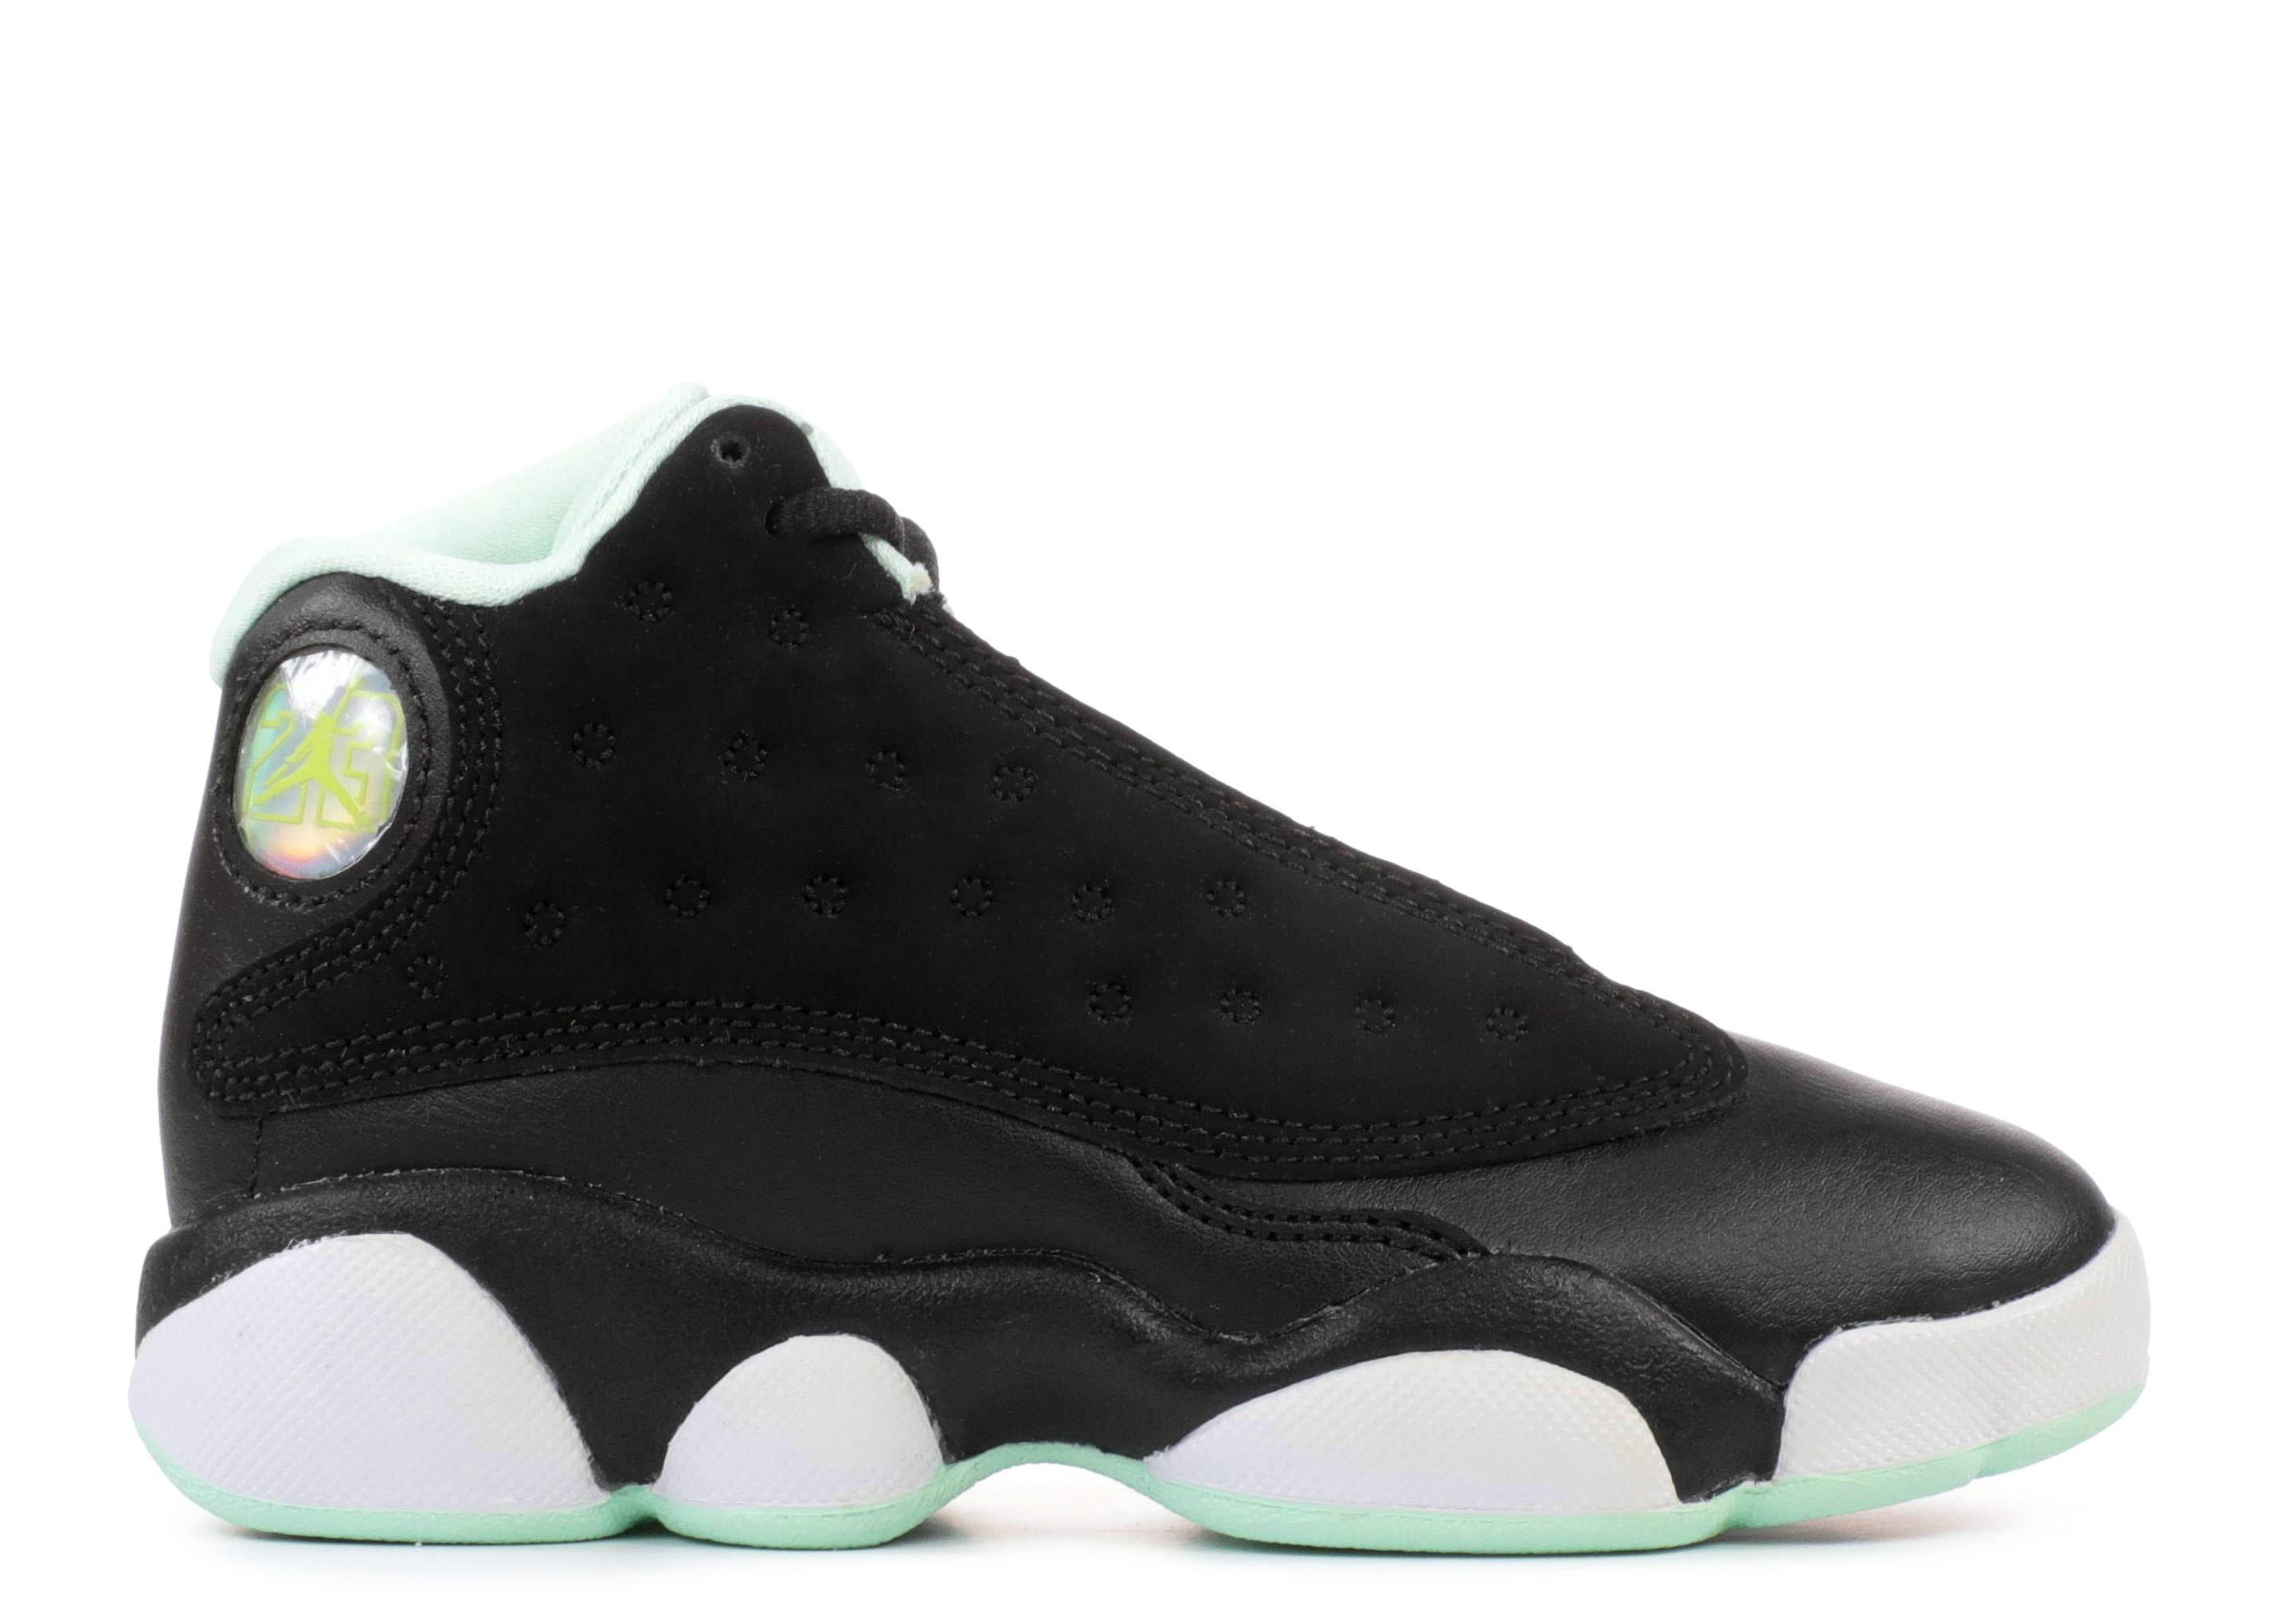 separation shoes 84c2e db88b Jordan 13 Retro gp